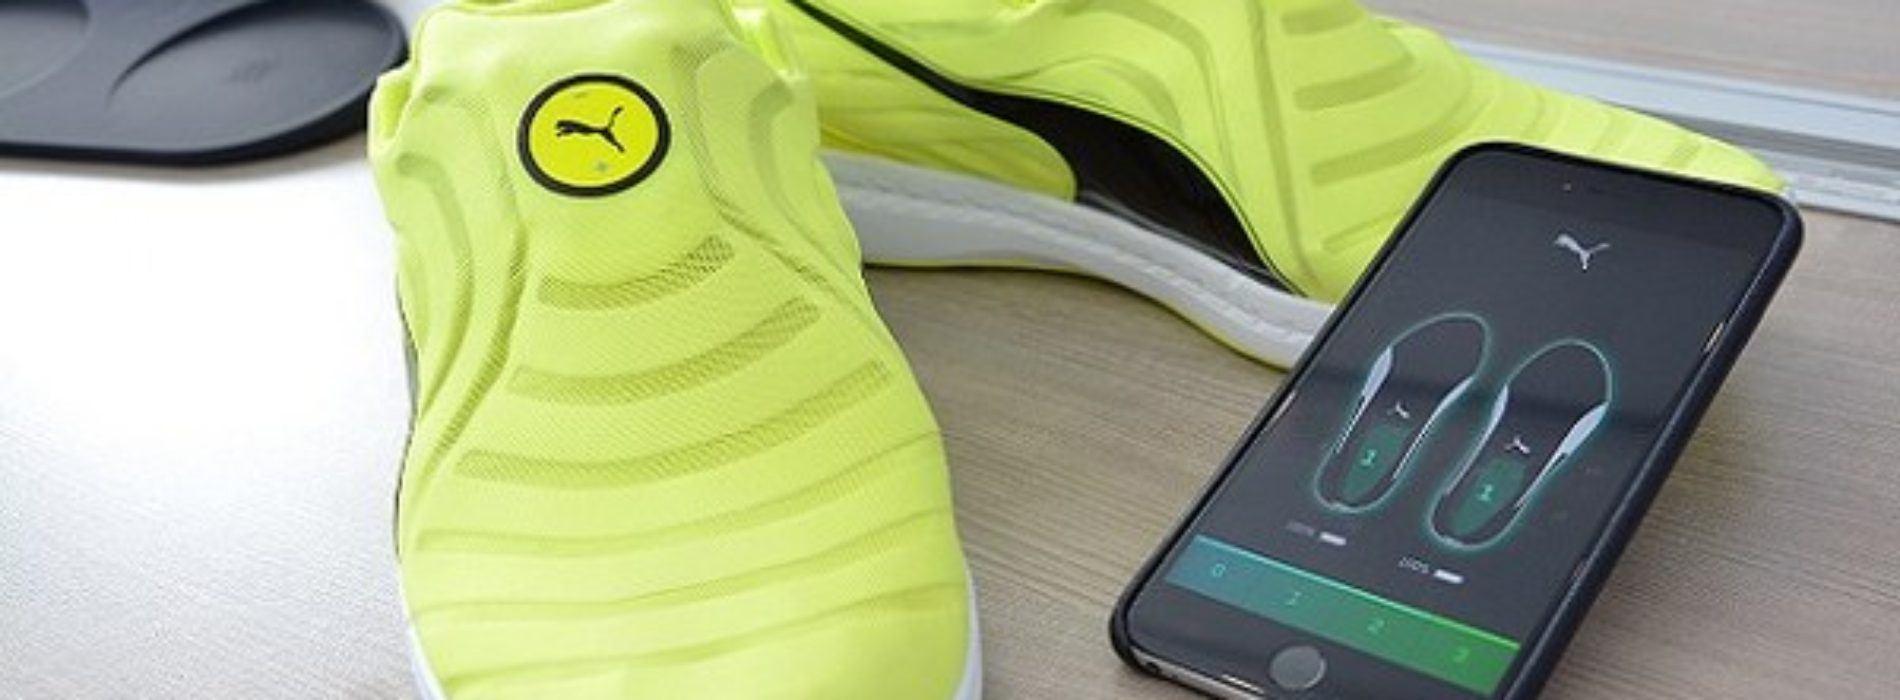 Puma compite con Nike saca sus zapatos Autodisc